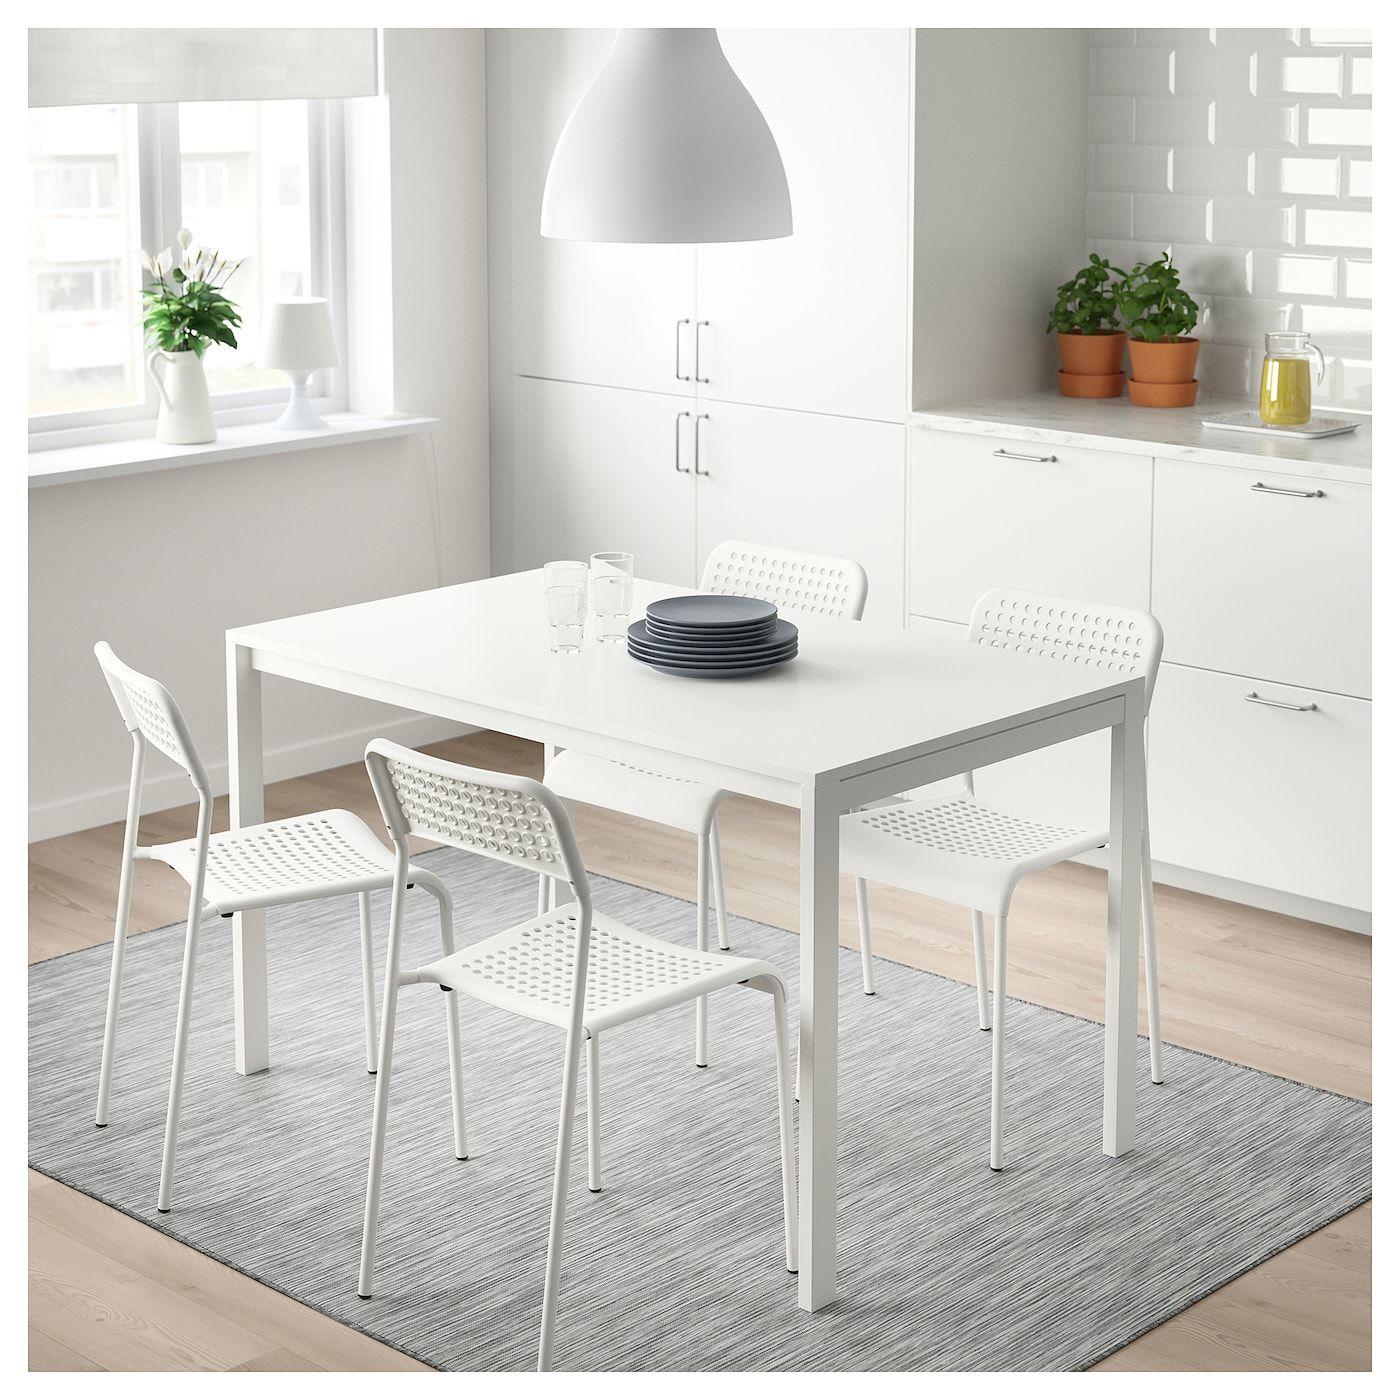 Adde Chair White Dining Room Design Ikea Room Wall Decor